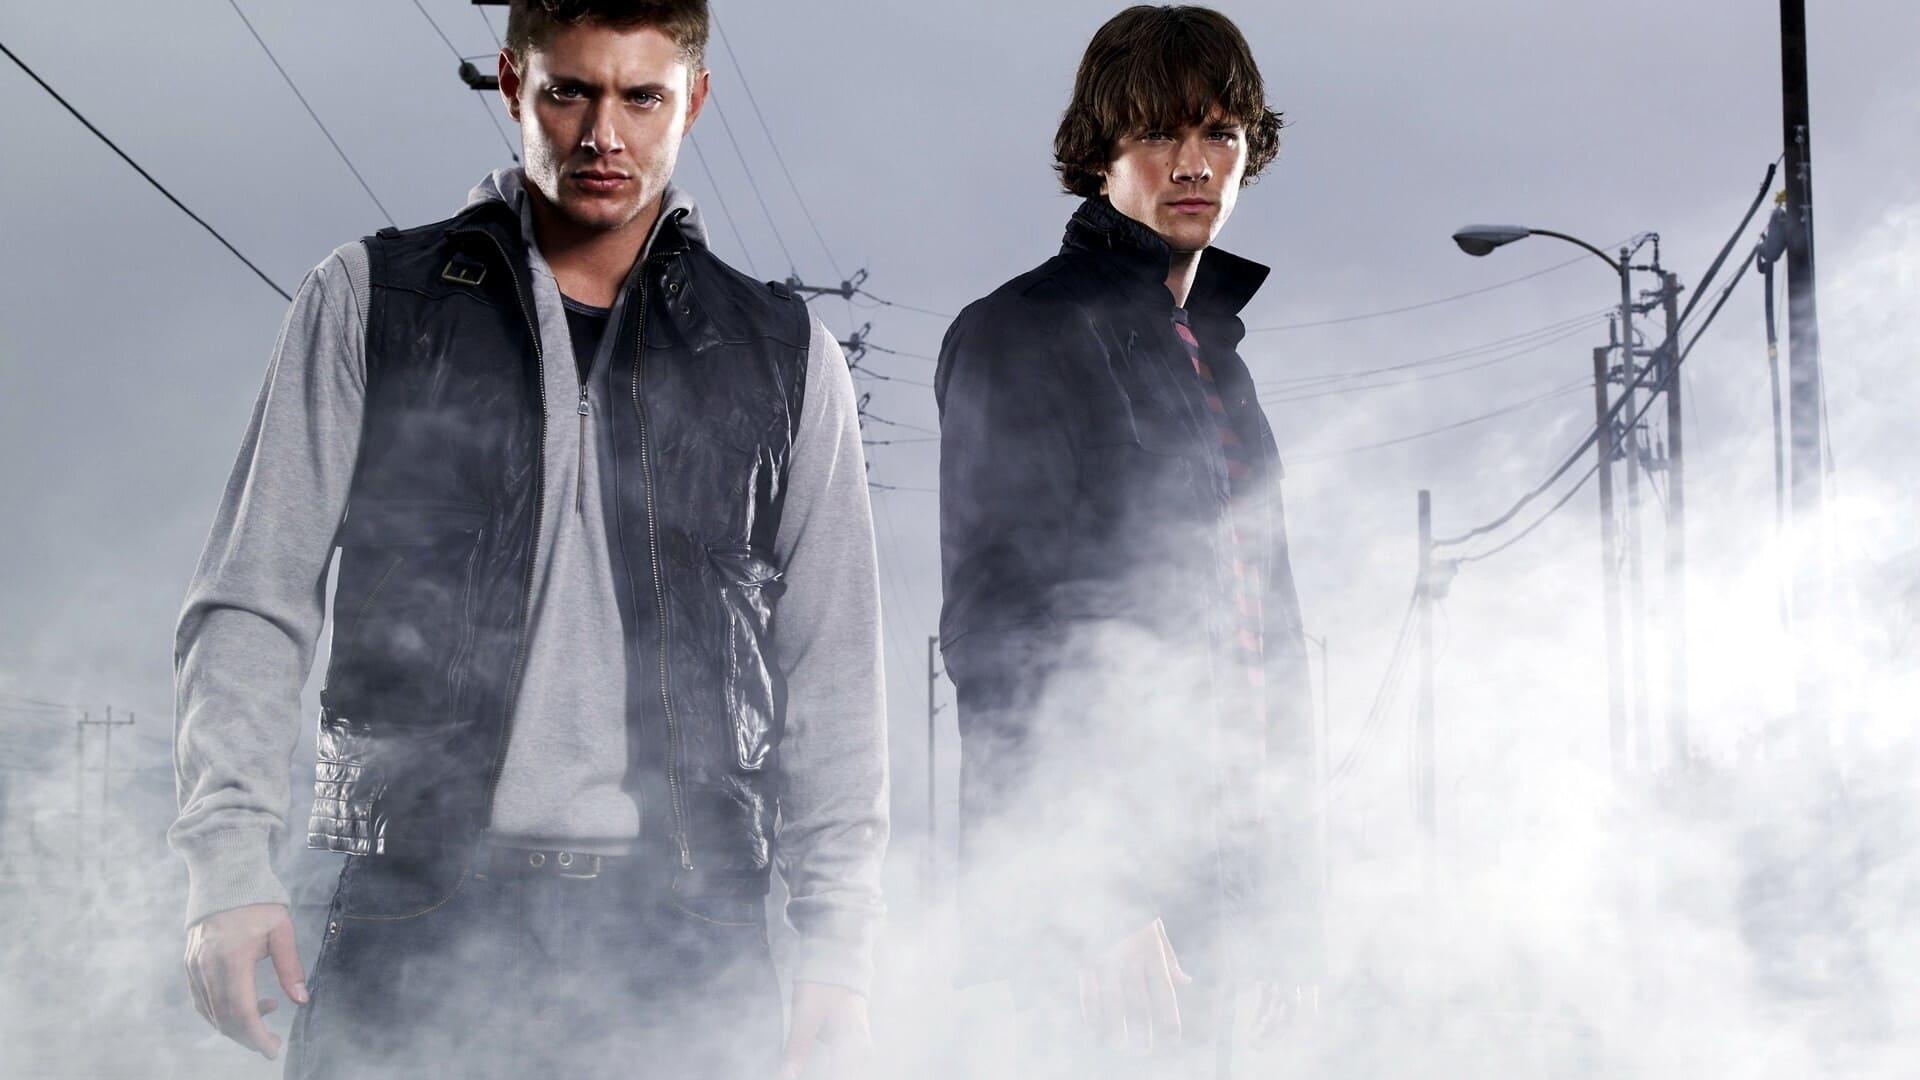 Supernatural - Season 14 Episode 2 Gods and Monsters